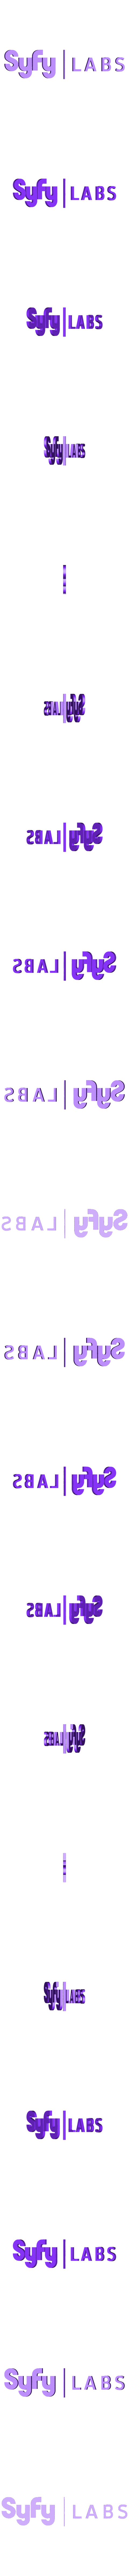 69c55b87 3c4e 4856 b441 a6679280ee06